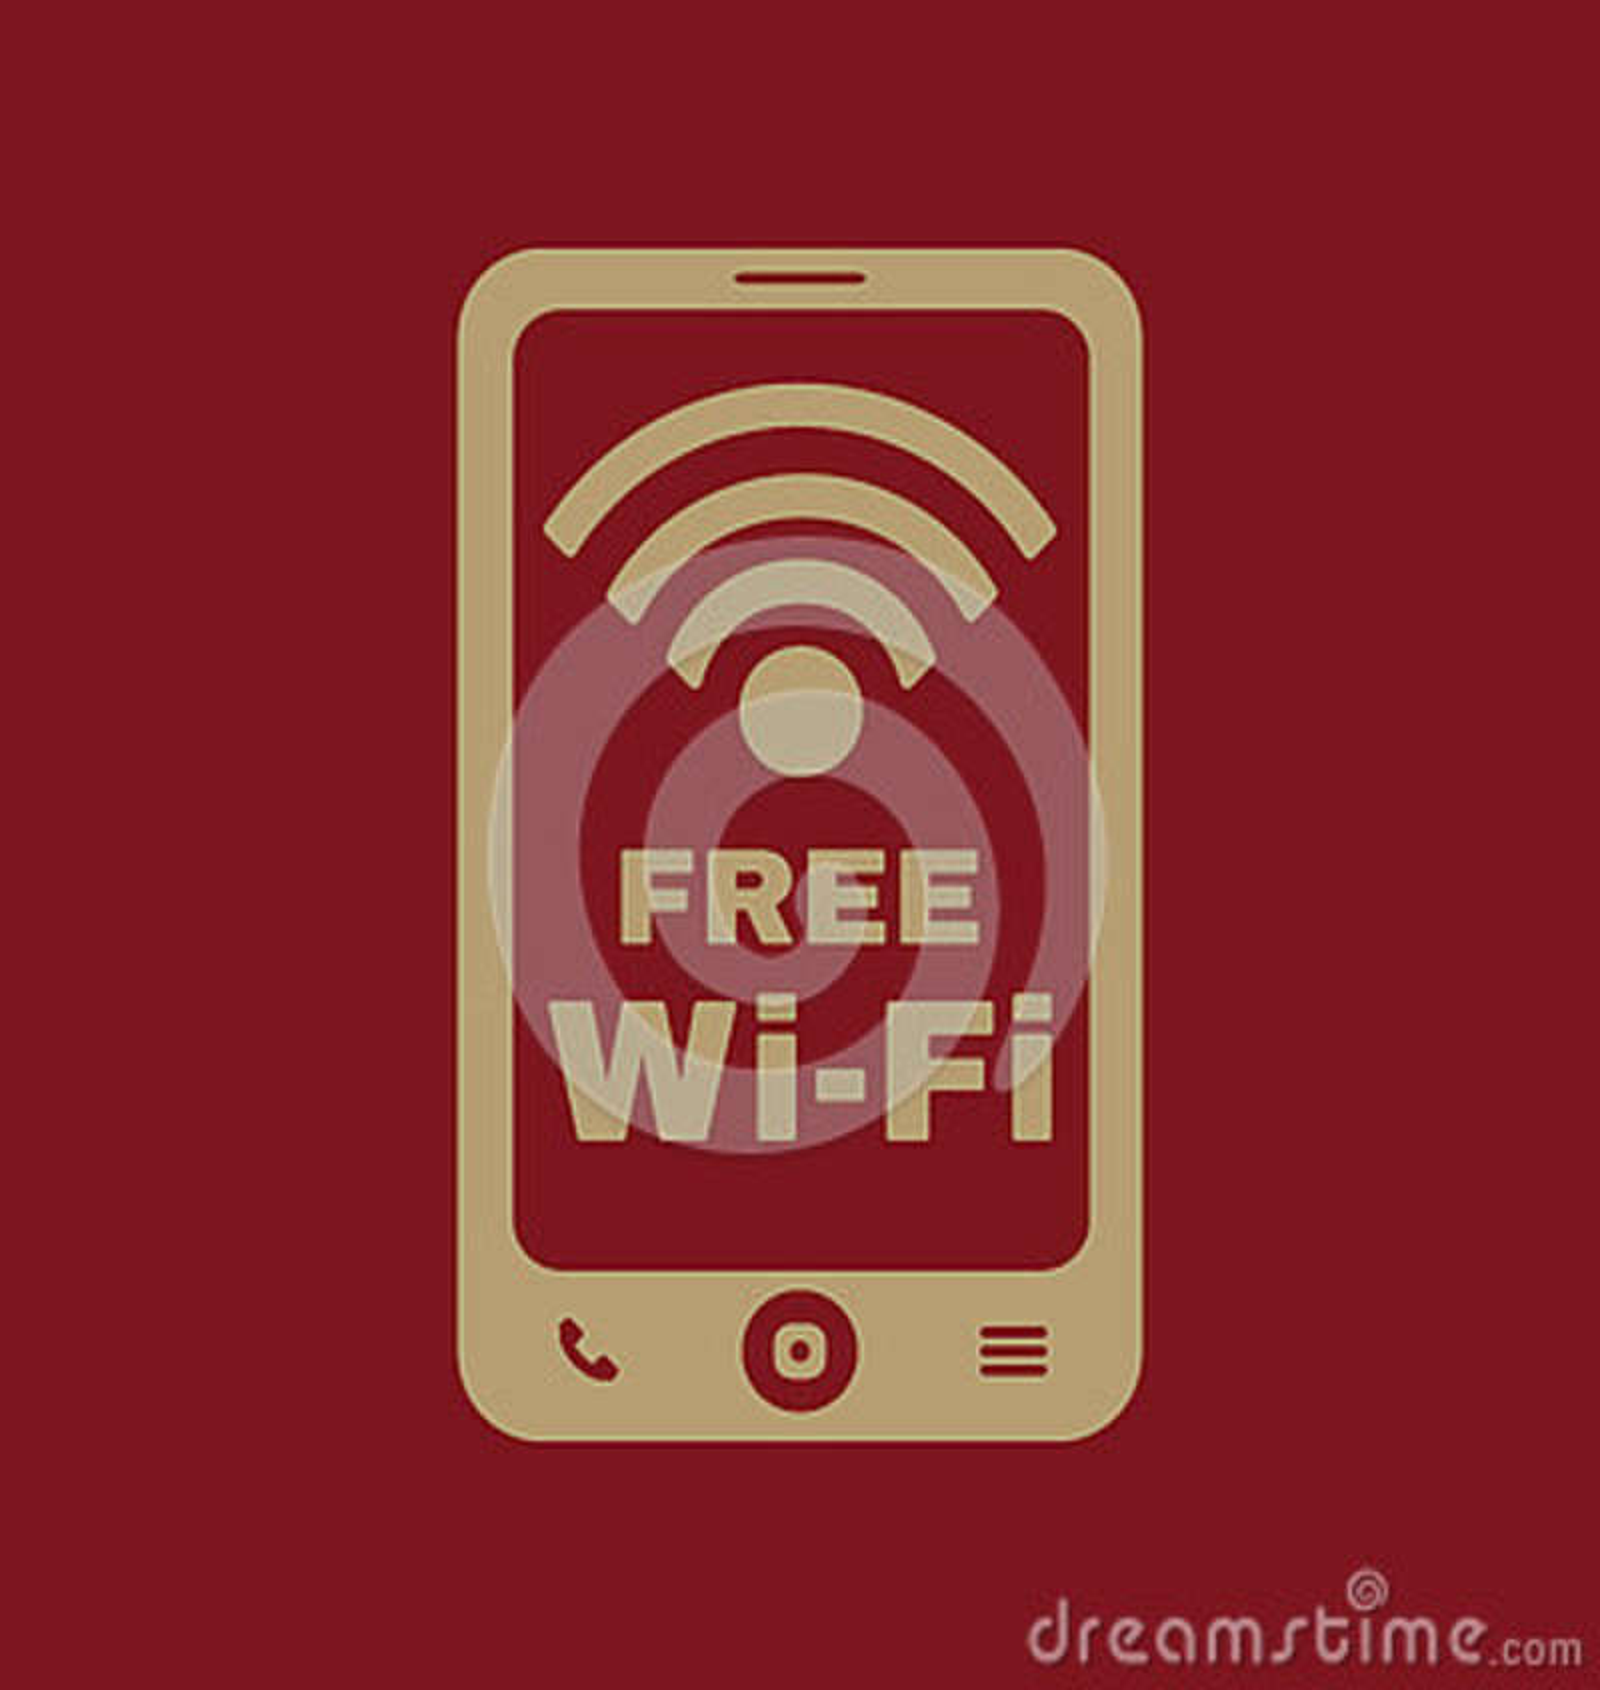 El icono del wifi Símbolo libre del wifi plano